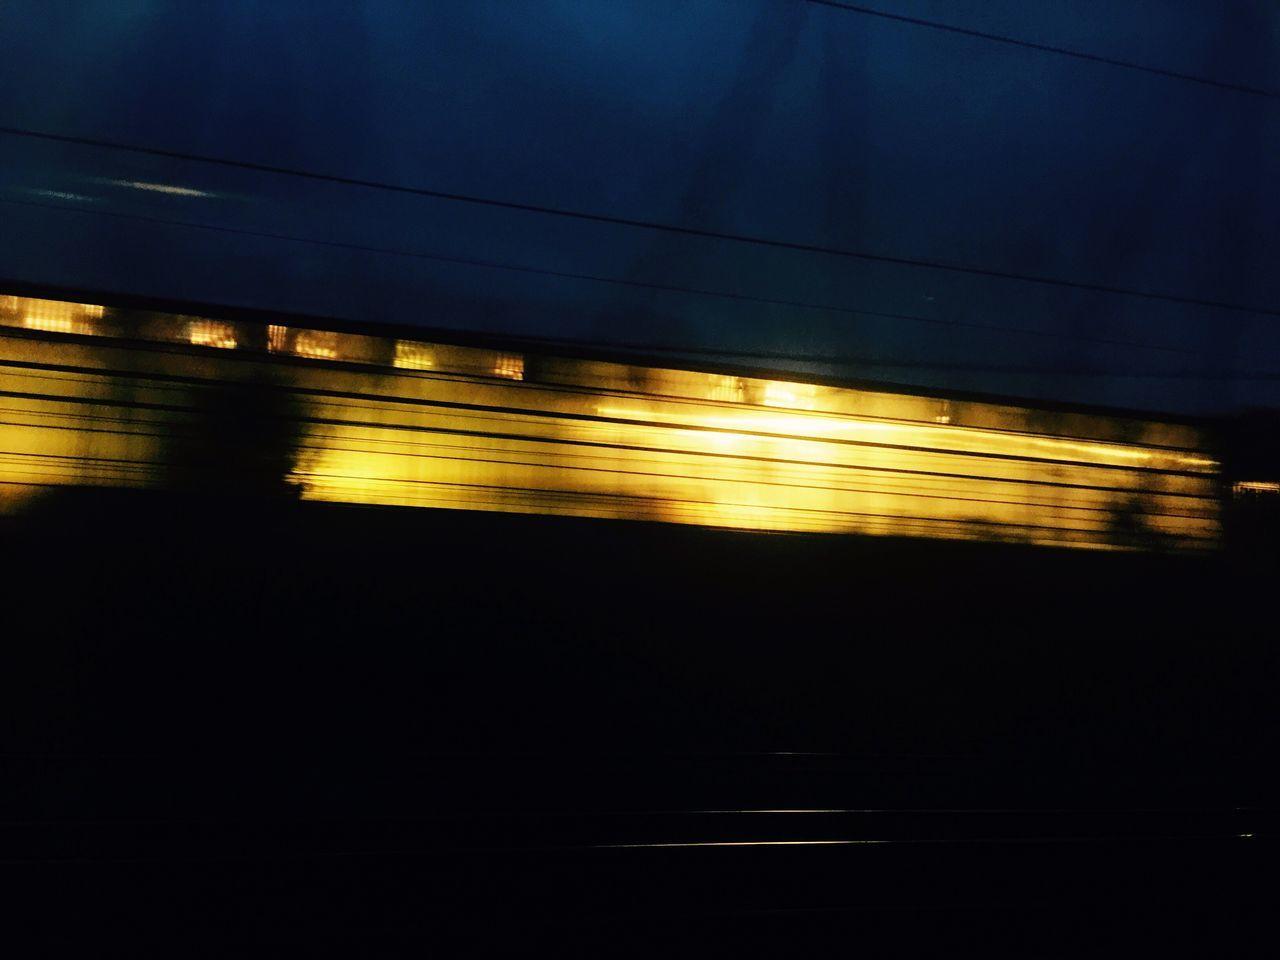 transportation, blurred motion, rail transportation, night, illuminated, public transportation, speed, train - vehicle, mode of transport, motion, no people, railroad track, outdoors